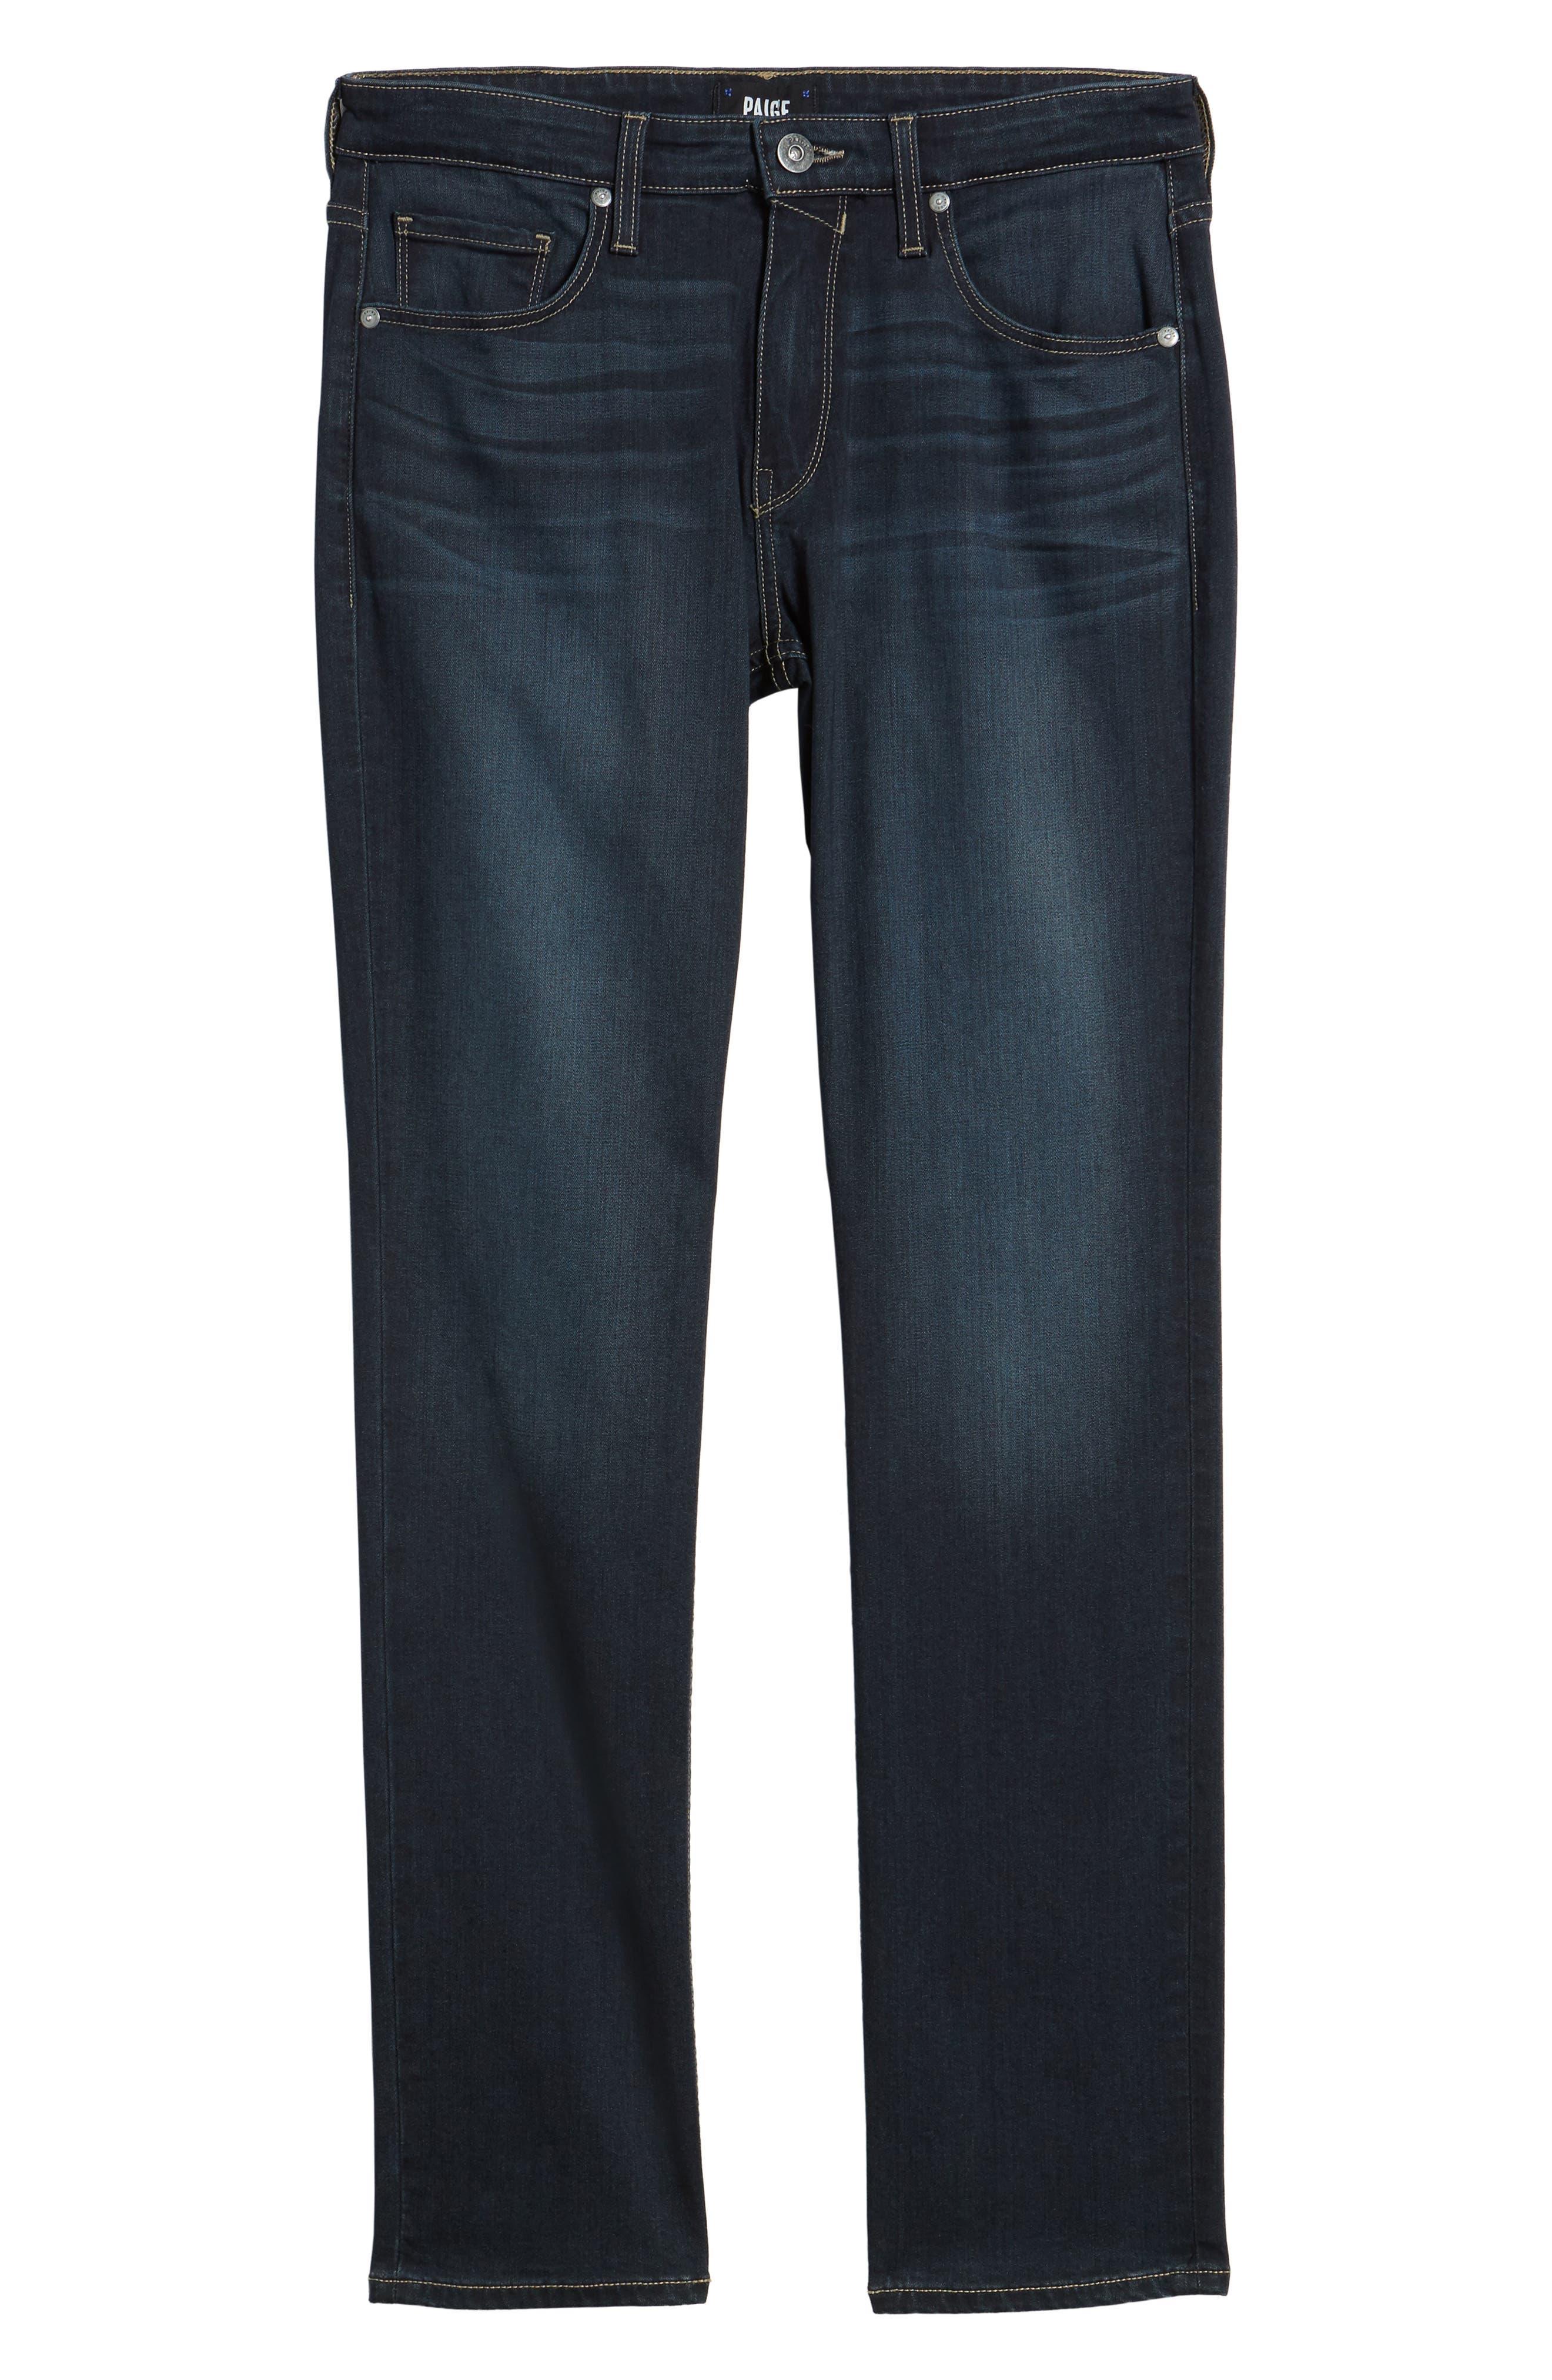 Transcend - Federal Slim Straight Leg Jeans,                             Alternate thumbnail 6, color,                             400